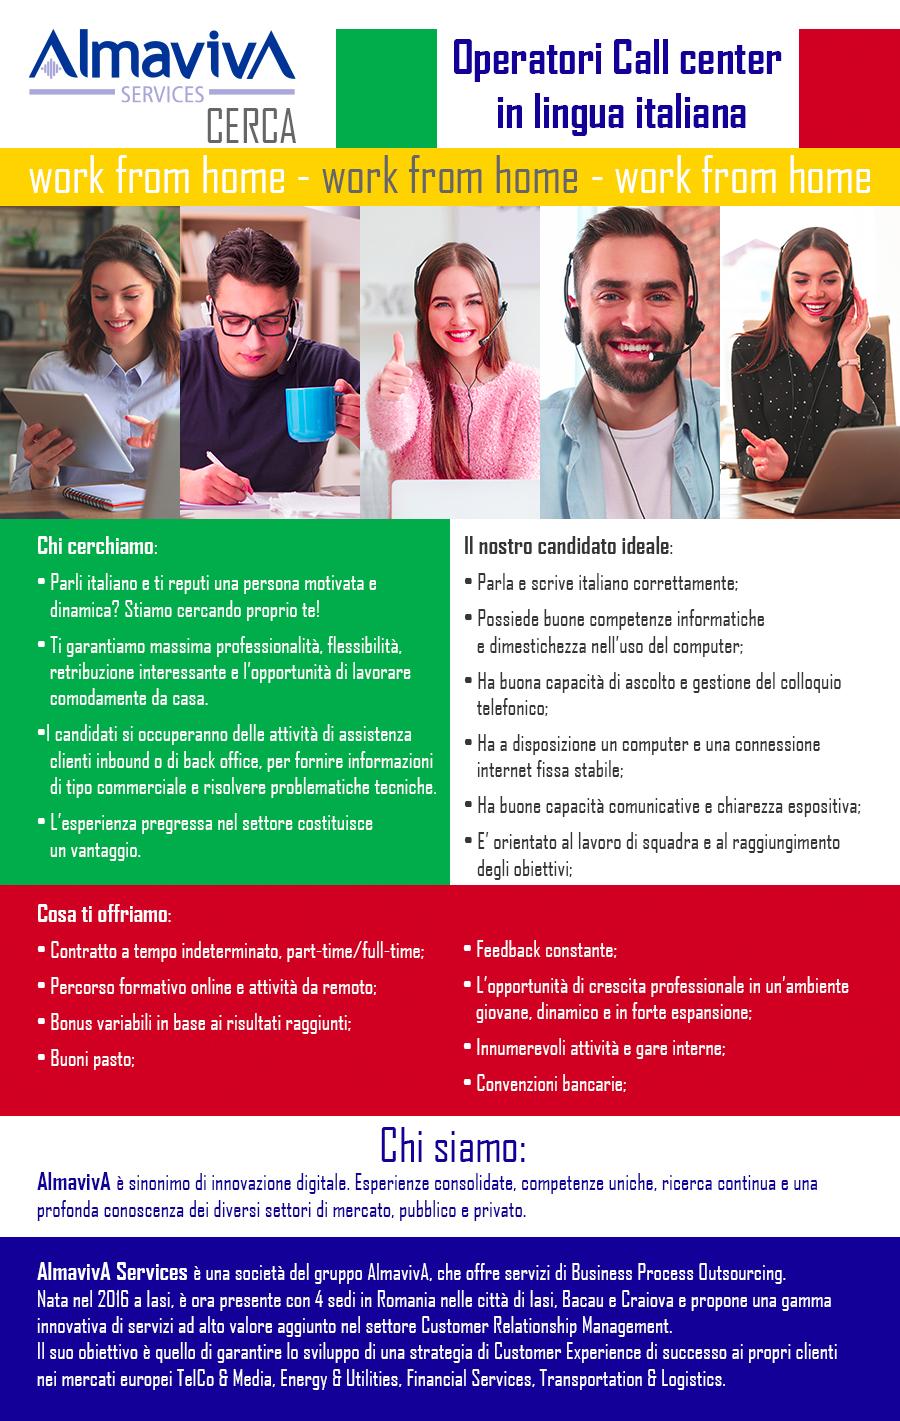 Operatore call center in lingua italiana – work from home